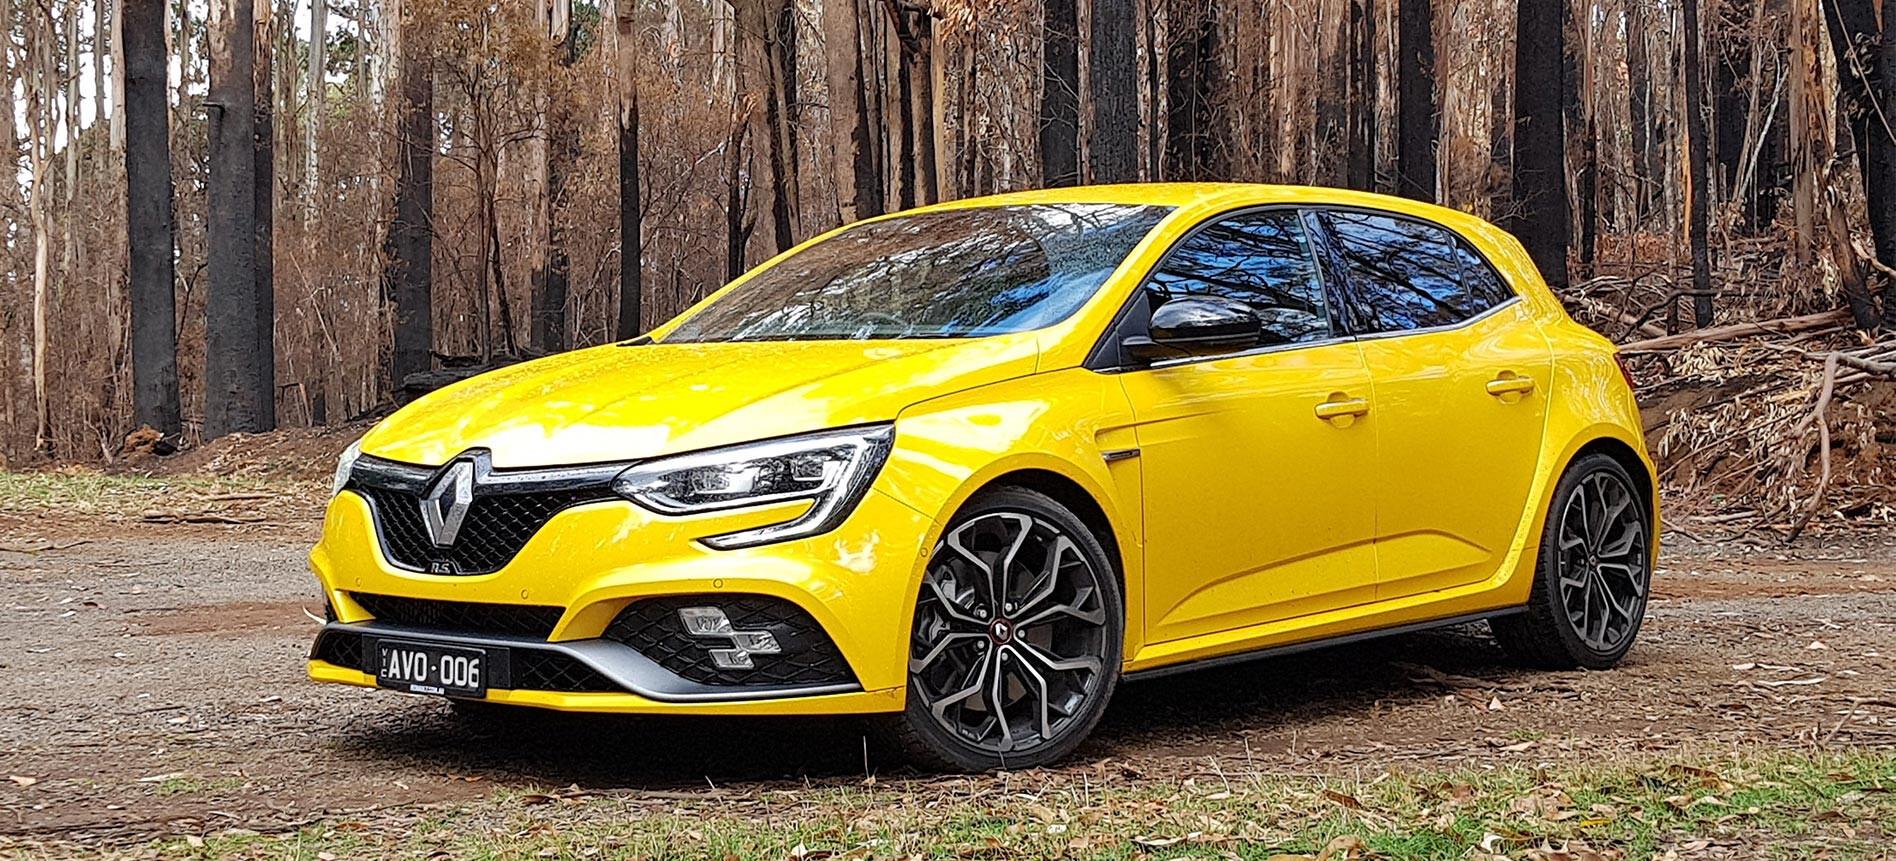 2019 Renault Megane RS280 long-term review feature